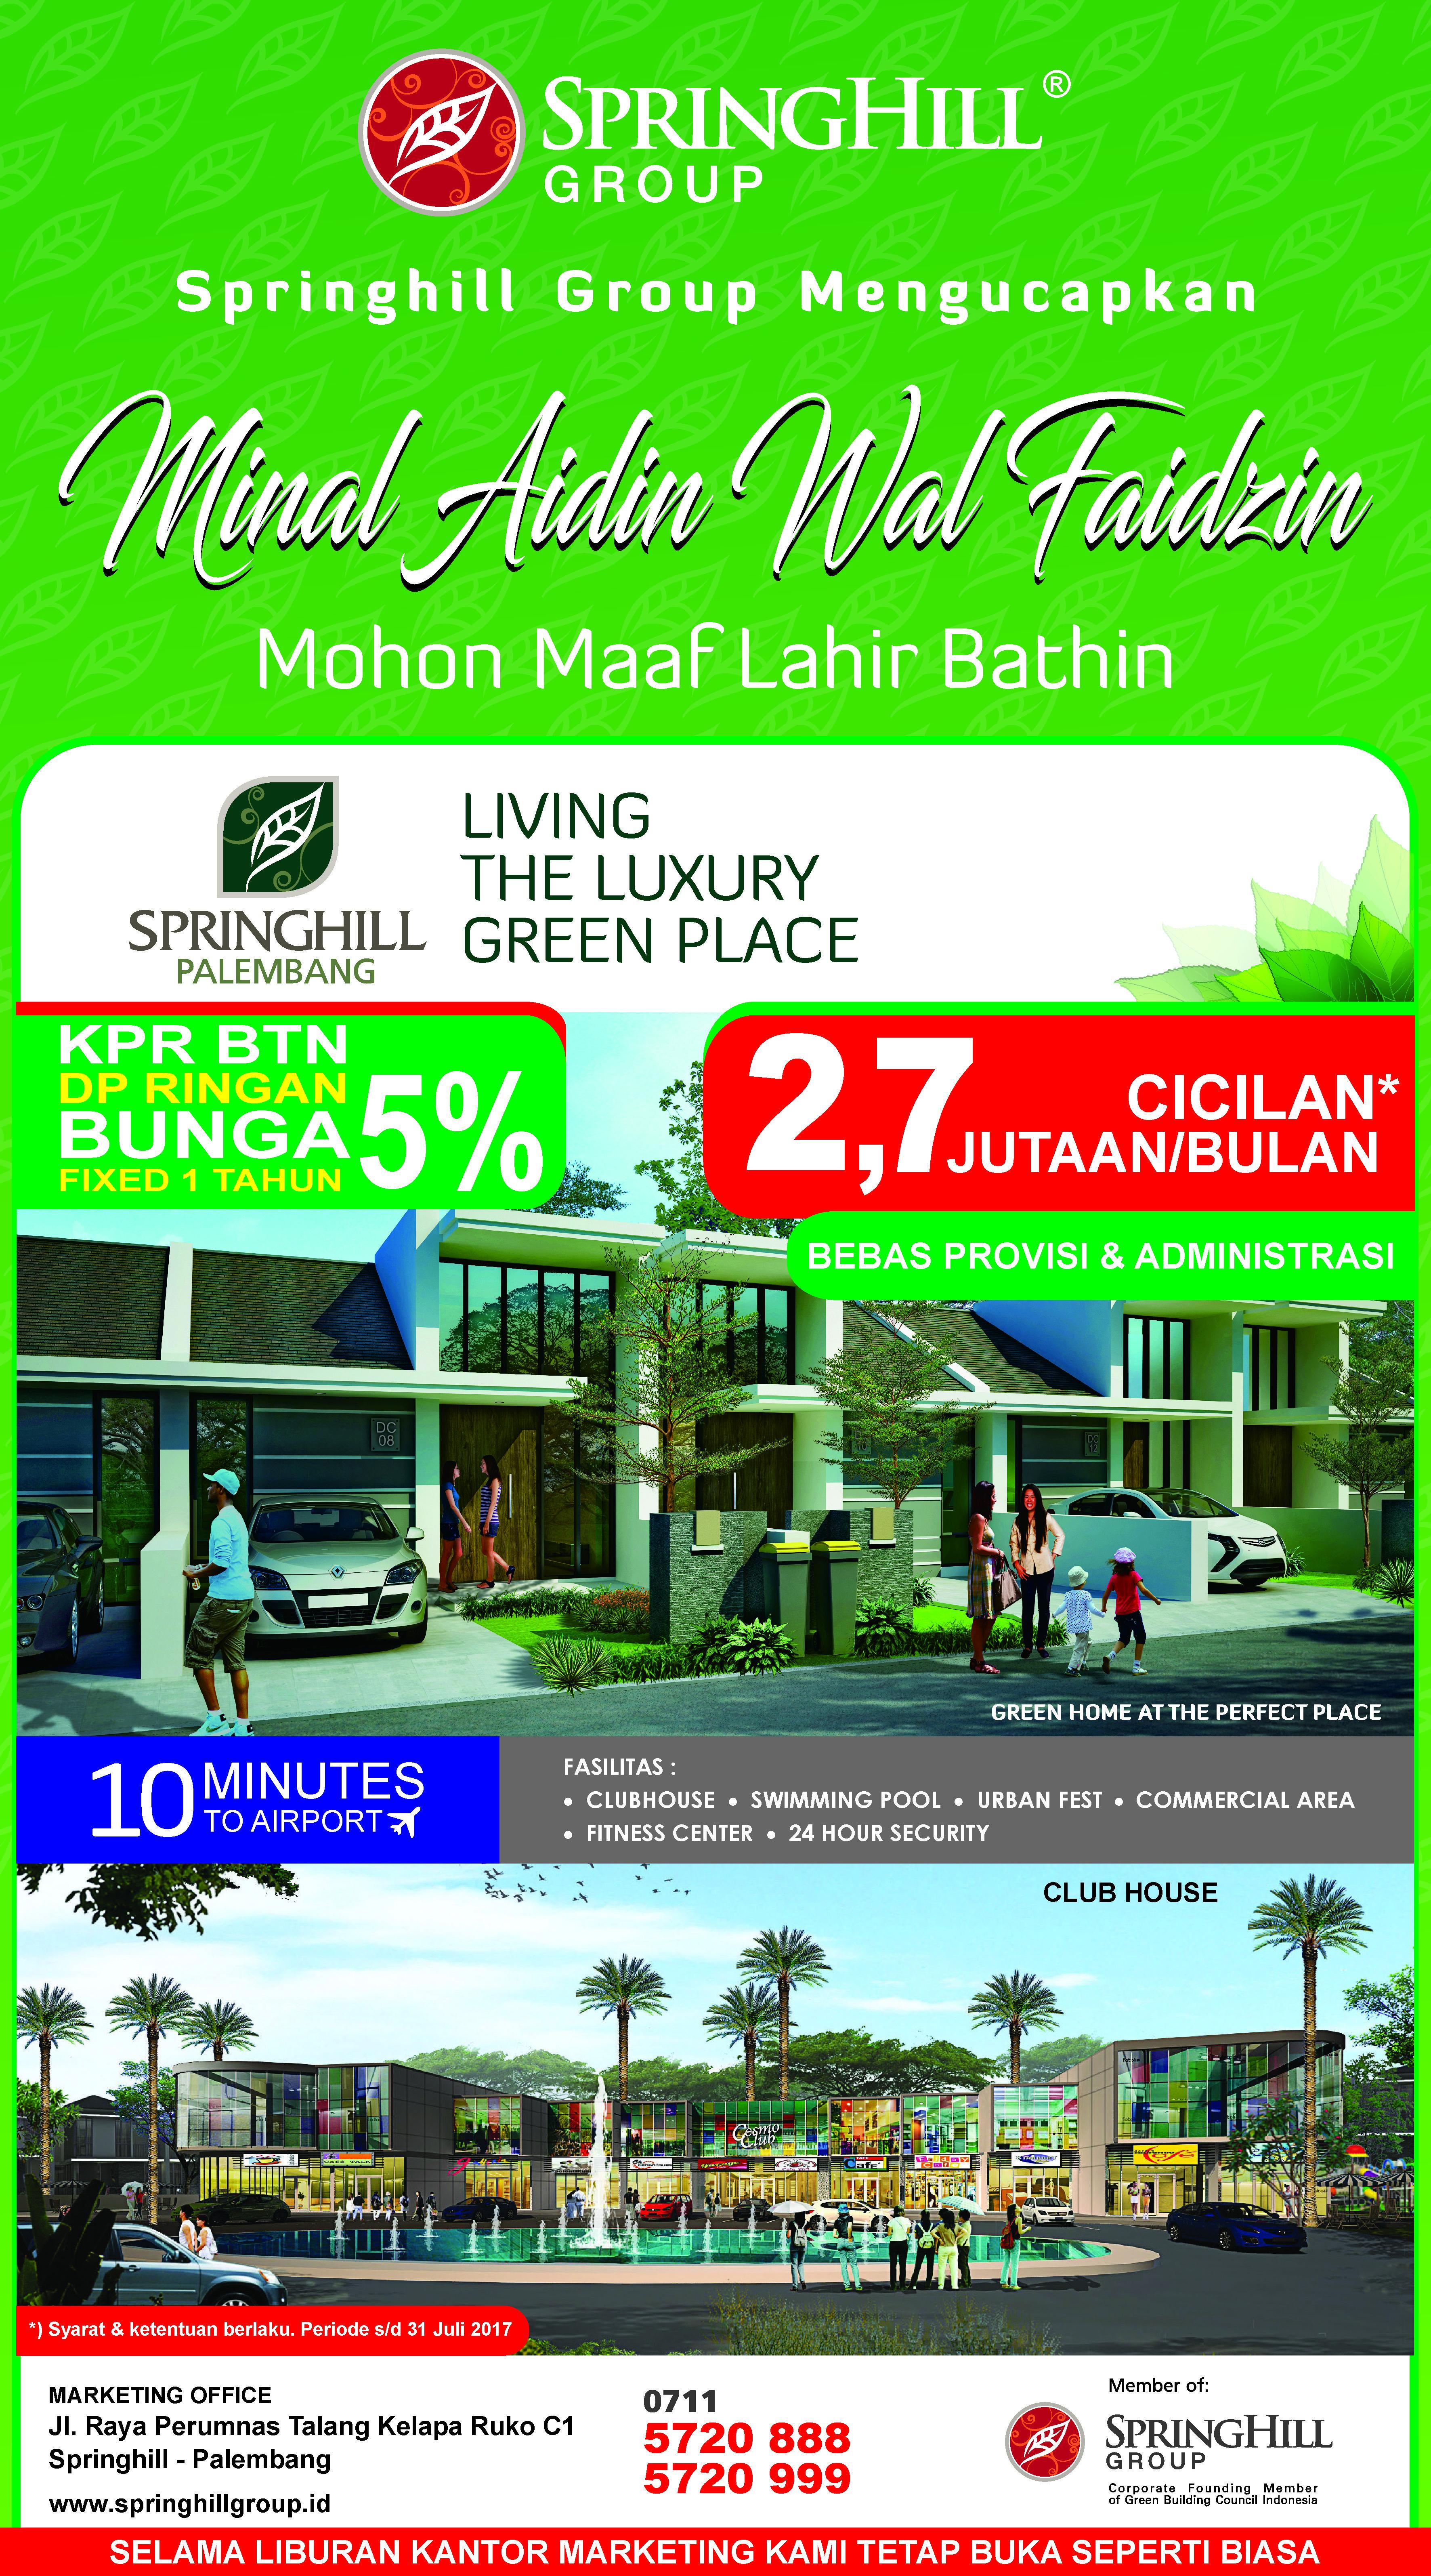 Springhill Group mengucapkan Minal Aidin Wal Faidzin, Mohon Maaf Lahir Bathin (Springhill Palembang)